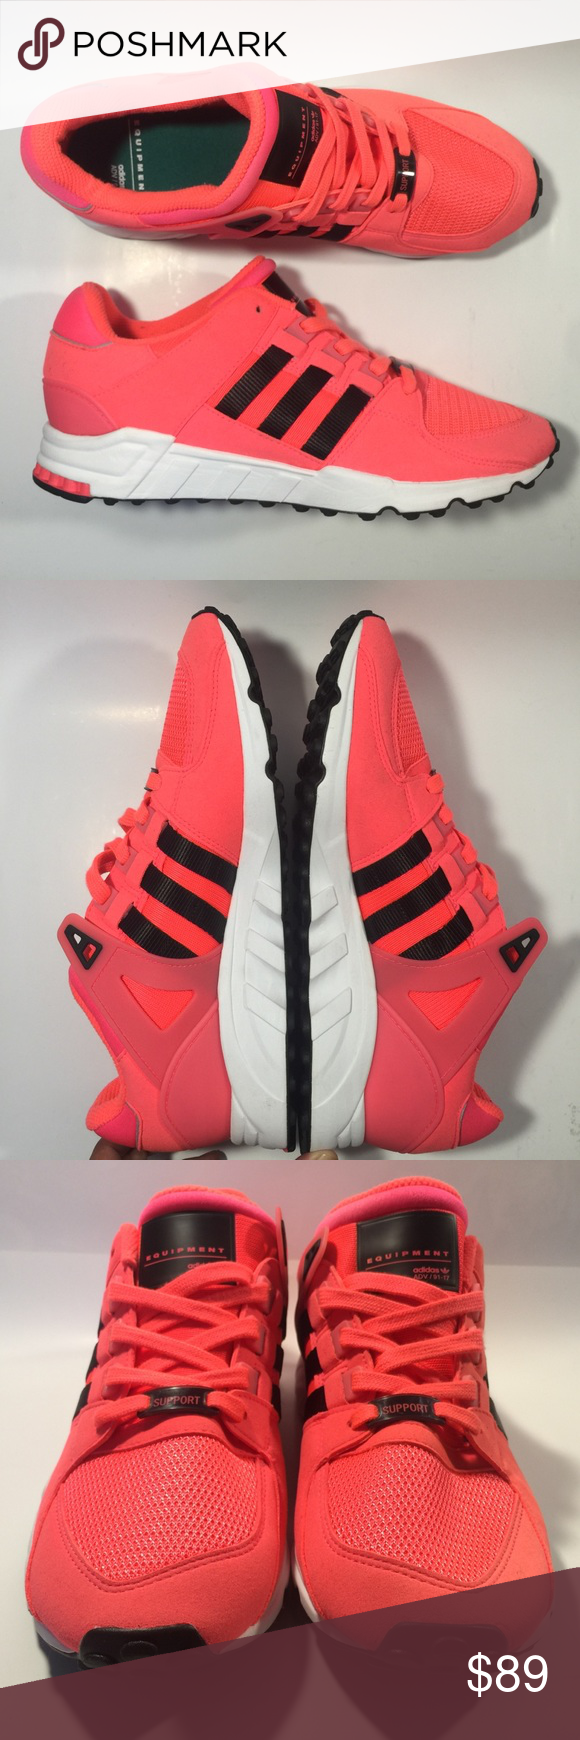 c1aec5af0bfa NWT Adidas originals eqt support Mens 9.5 Brand new (no box) never worn  turbo core black mens size 9.5 art code BB1321 adidas Shoes Sneakers